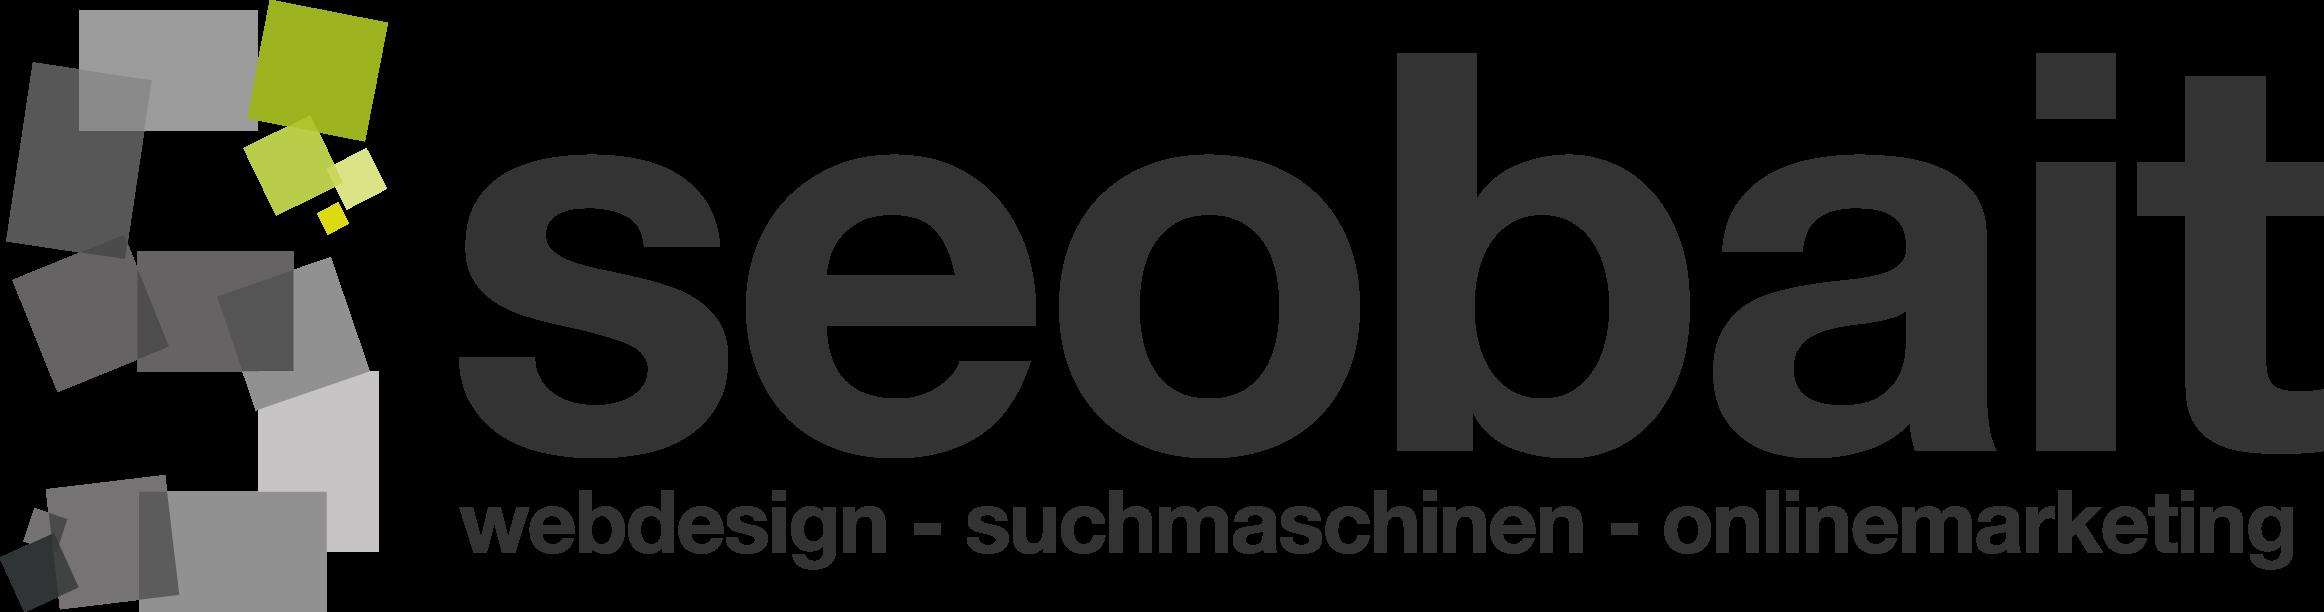 Seobait